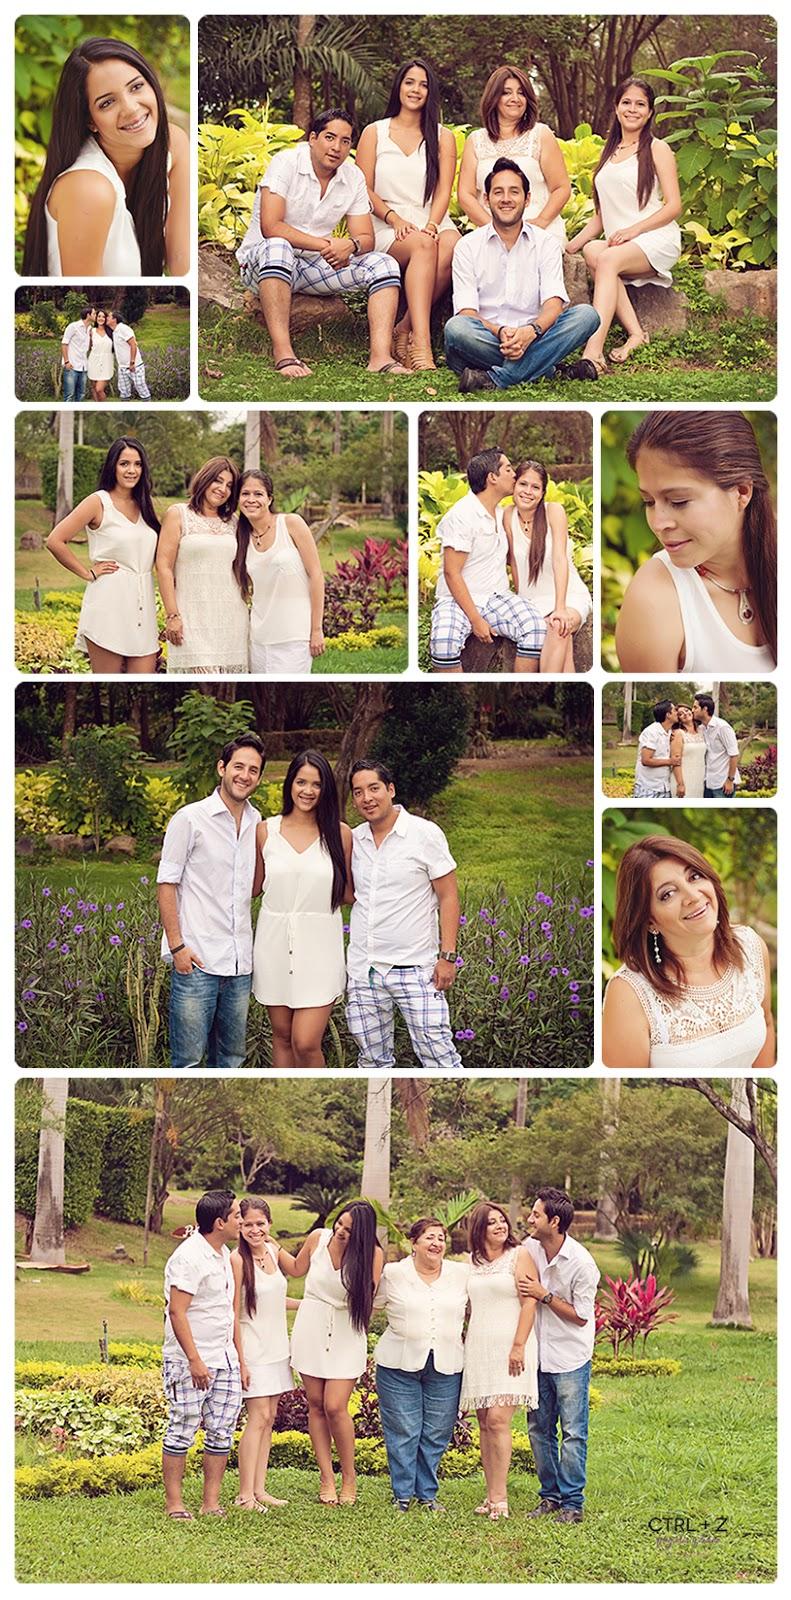 Blog-Collage-1394053443789.jpg